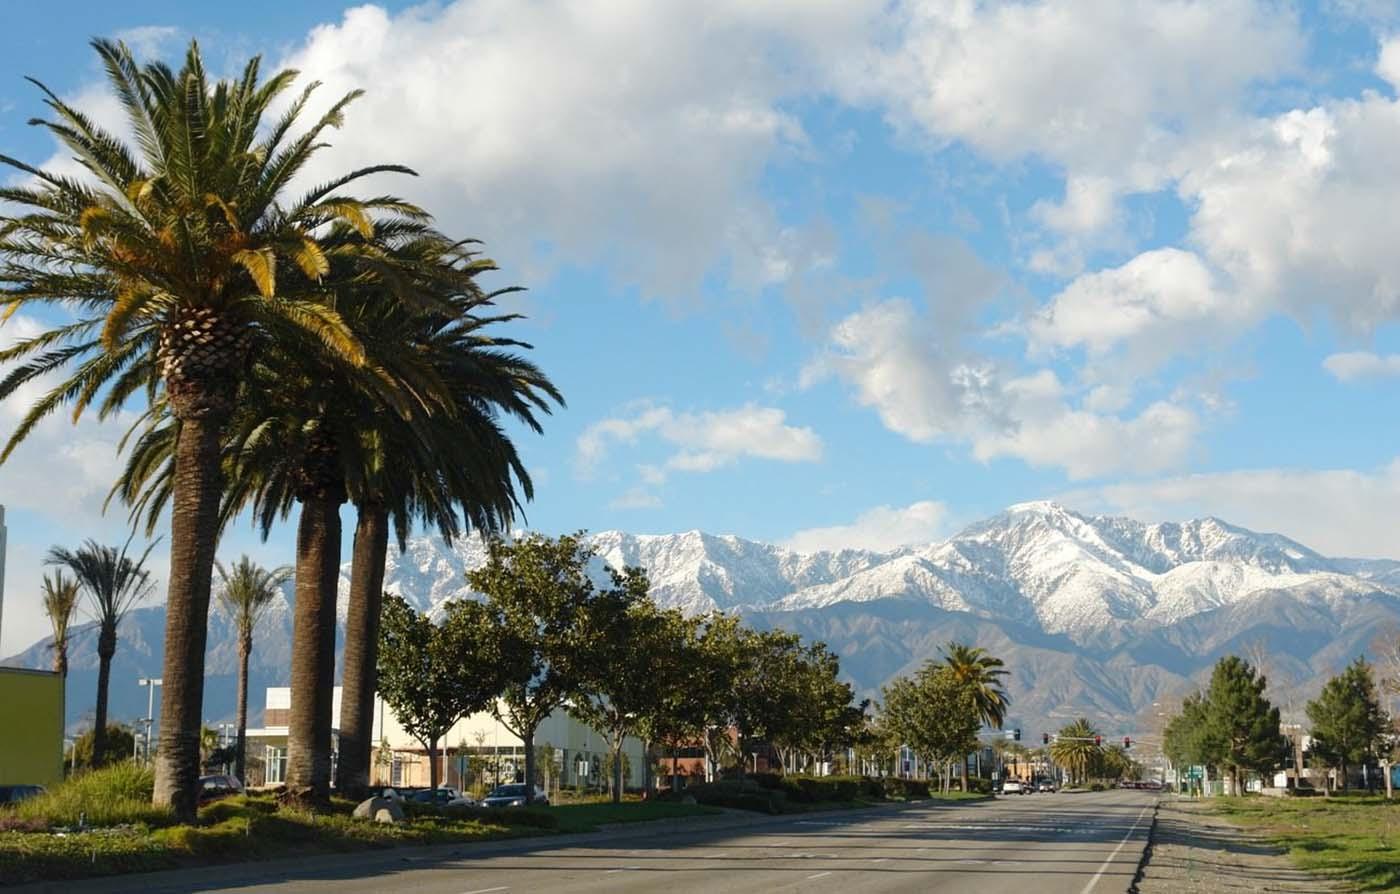 Rancho Cucamonga Plastic Surgeon, Dr. Maan Kattash has an office located at 8710 Monroe Court, Suite 250, Rancho Cucamonga, CA 91730